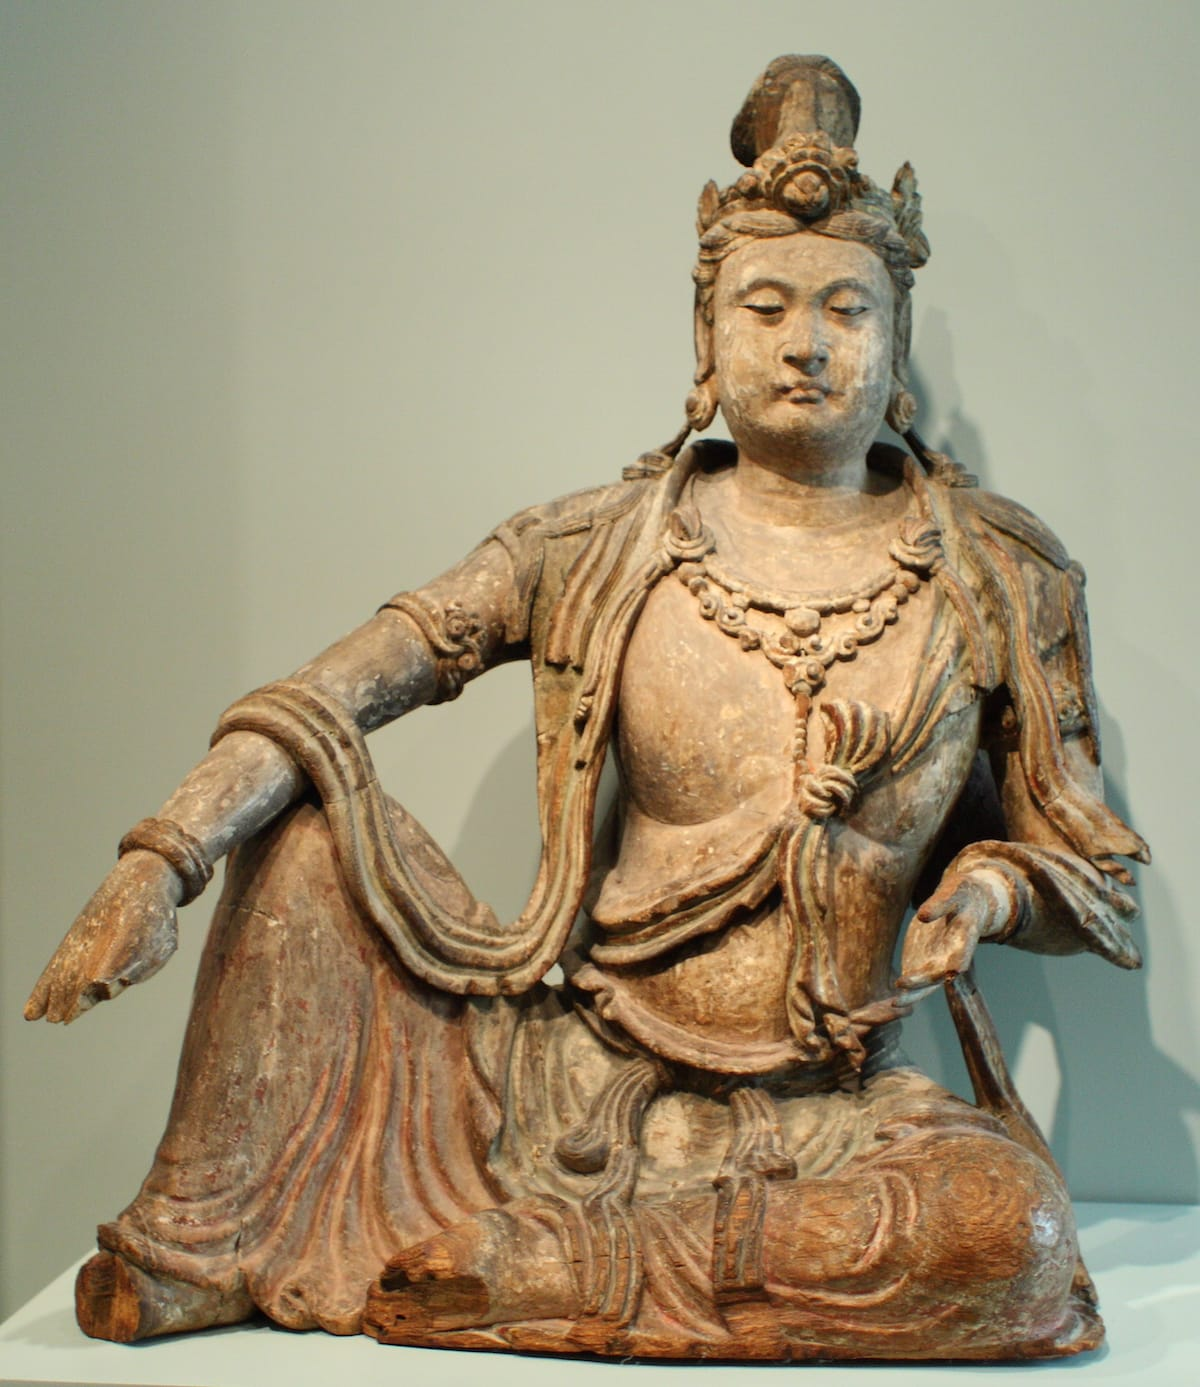 Bodhisattva, Bodhichitta, Sakyong Mipham, Shambhala Sun, Lion's Roar, Buddhism, Vajrayana